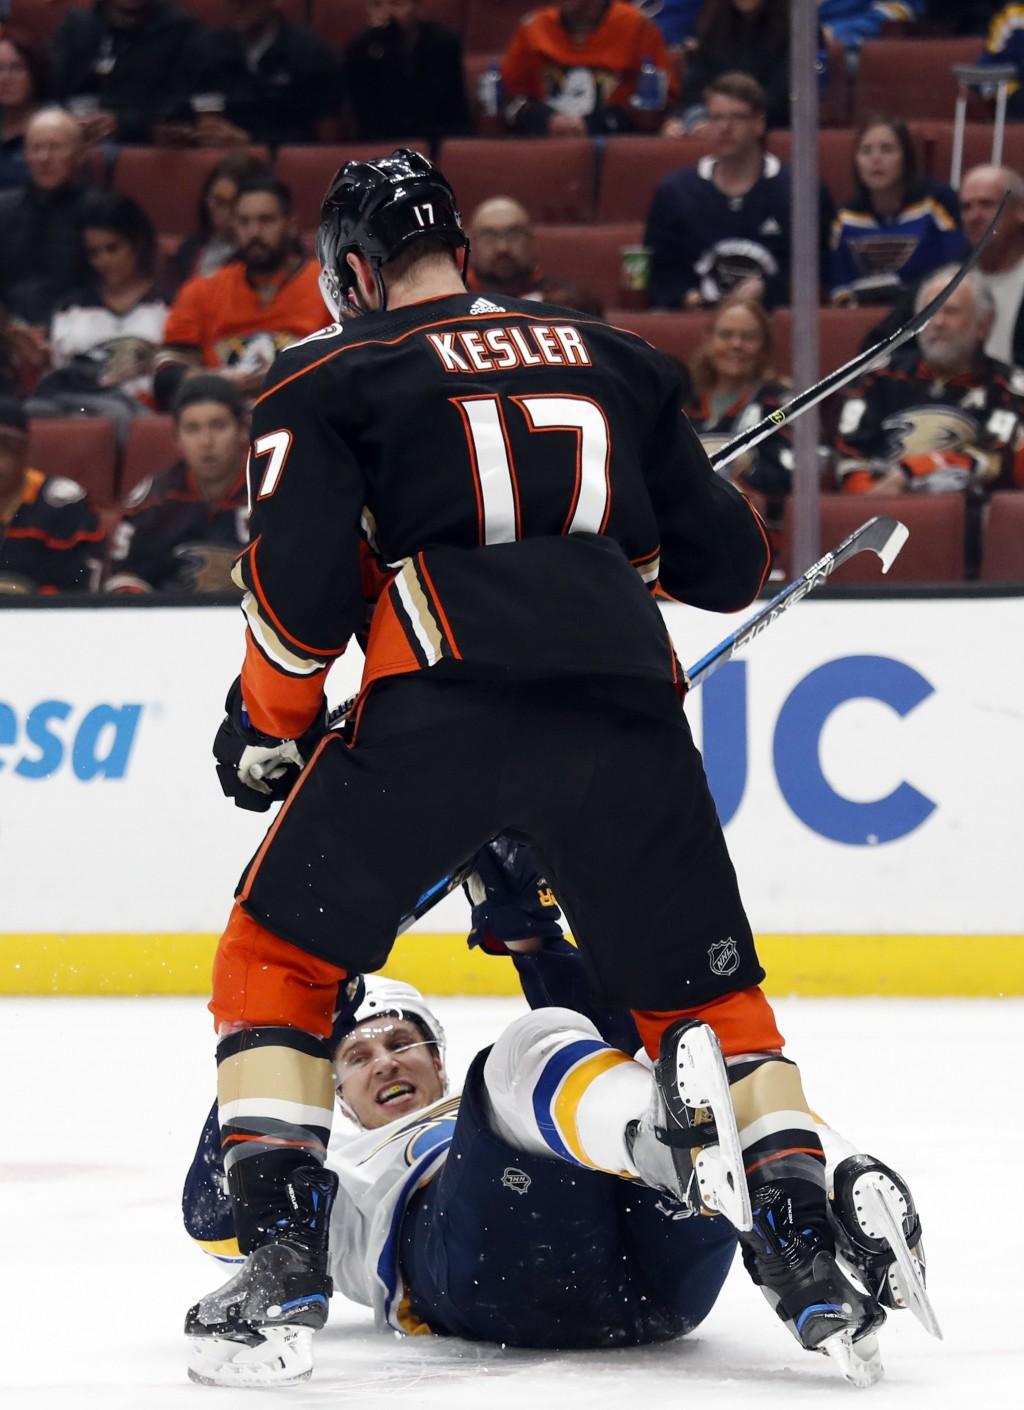 Anaheim Ducks' Ryan Kesler, top, shoves St. Louis Blues' Brayden Schenn during the first period of an NHL hockey game Monday, March 12, 2018, in Anahe